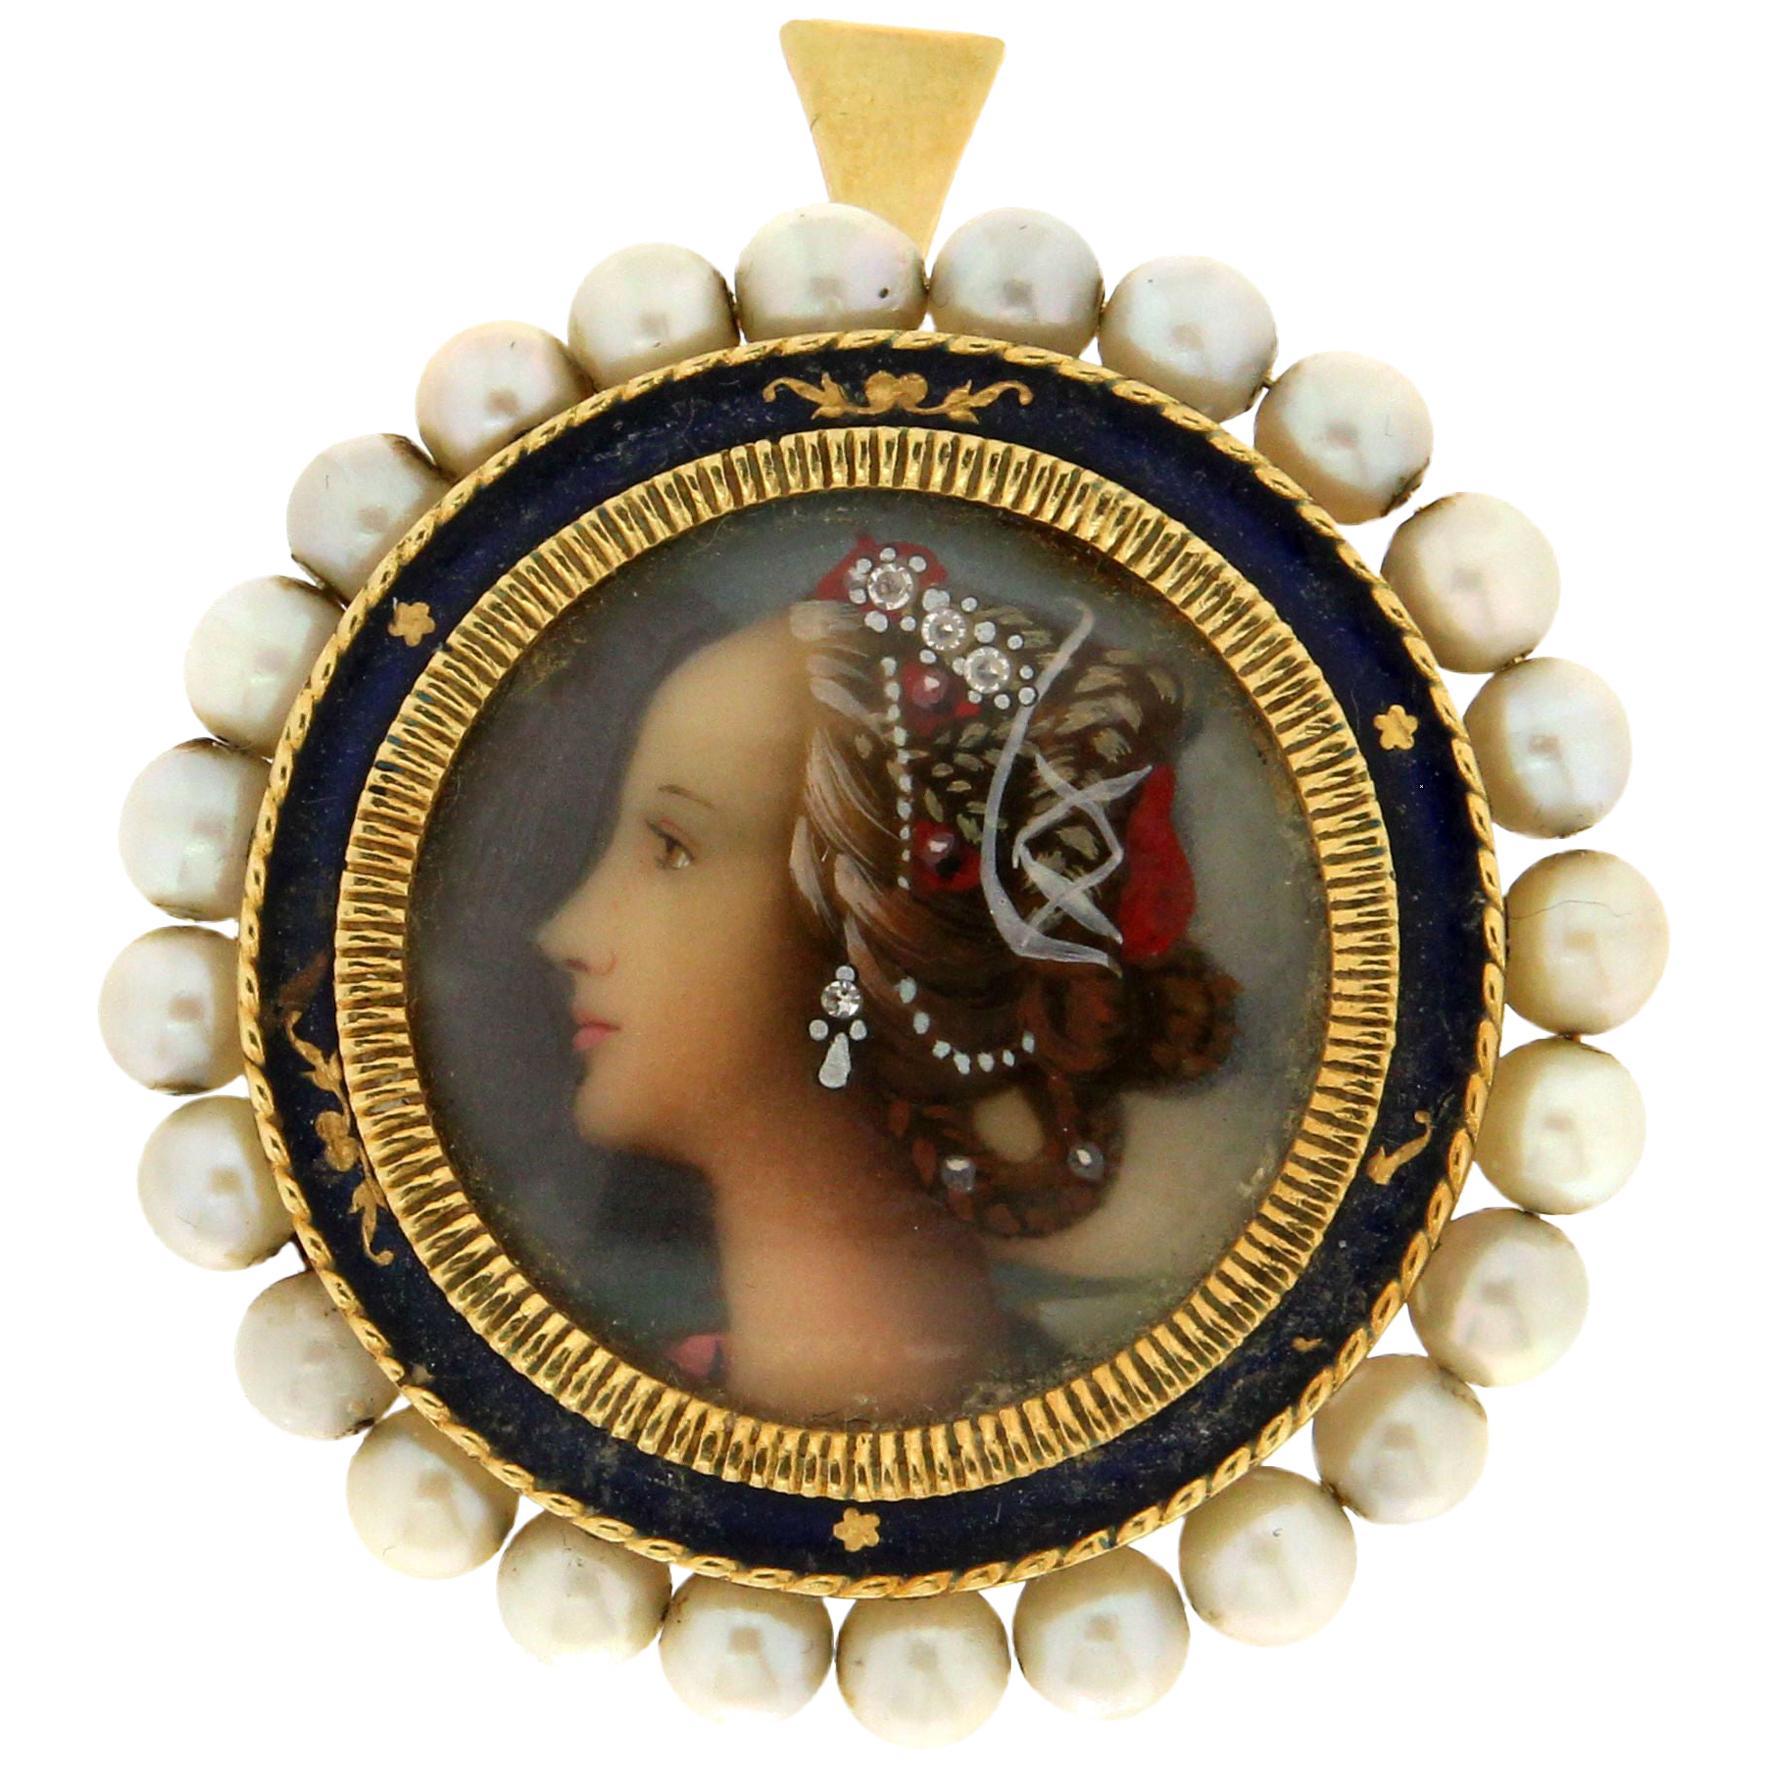 Handcraft 18 Karat Yellow Gold Pearls Brooch Pendant